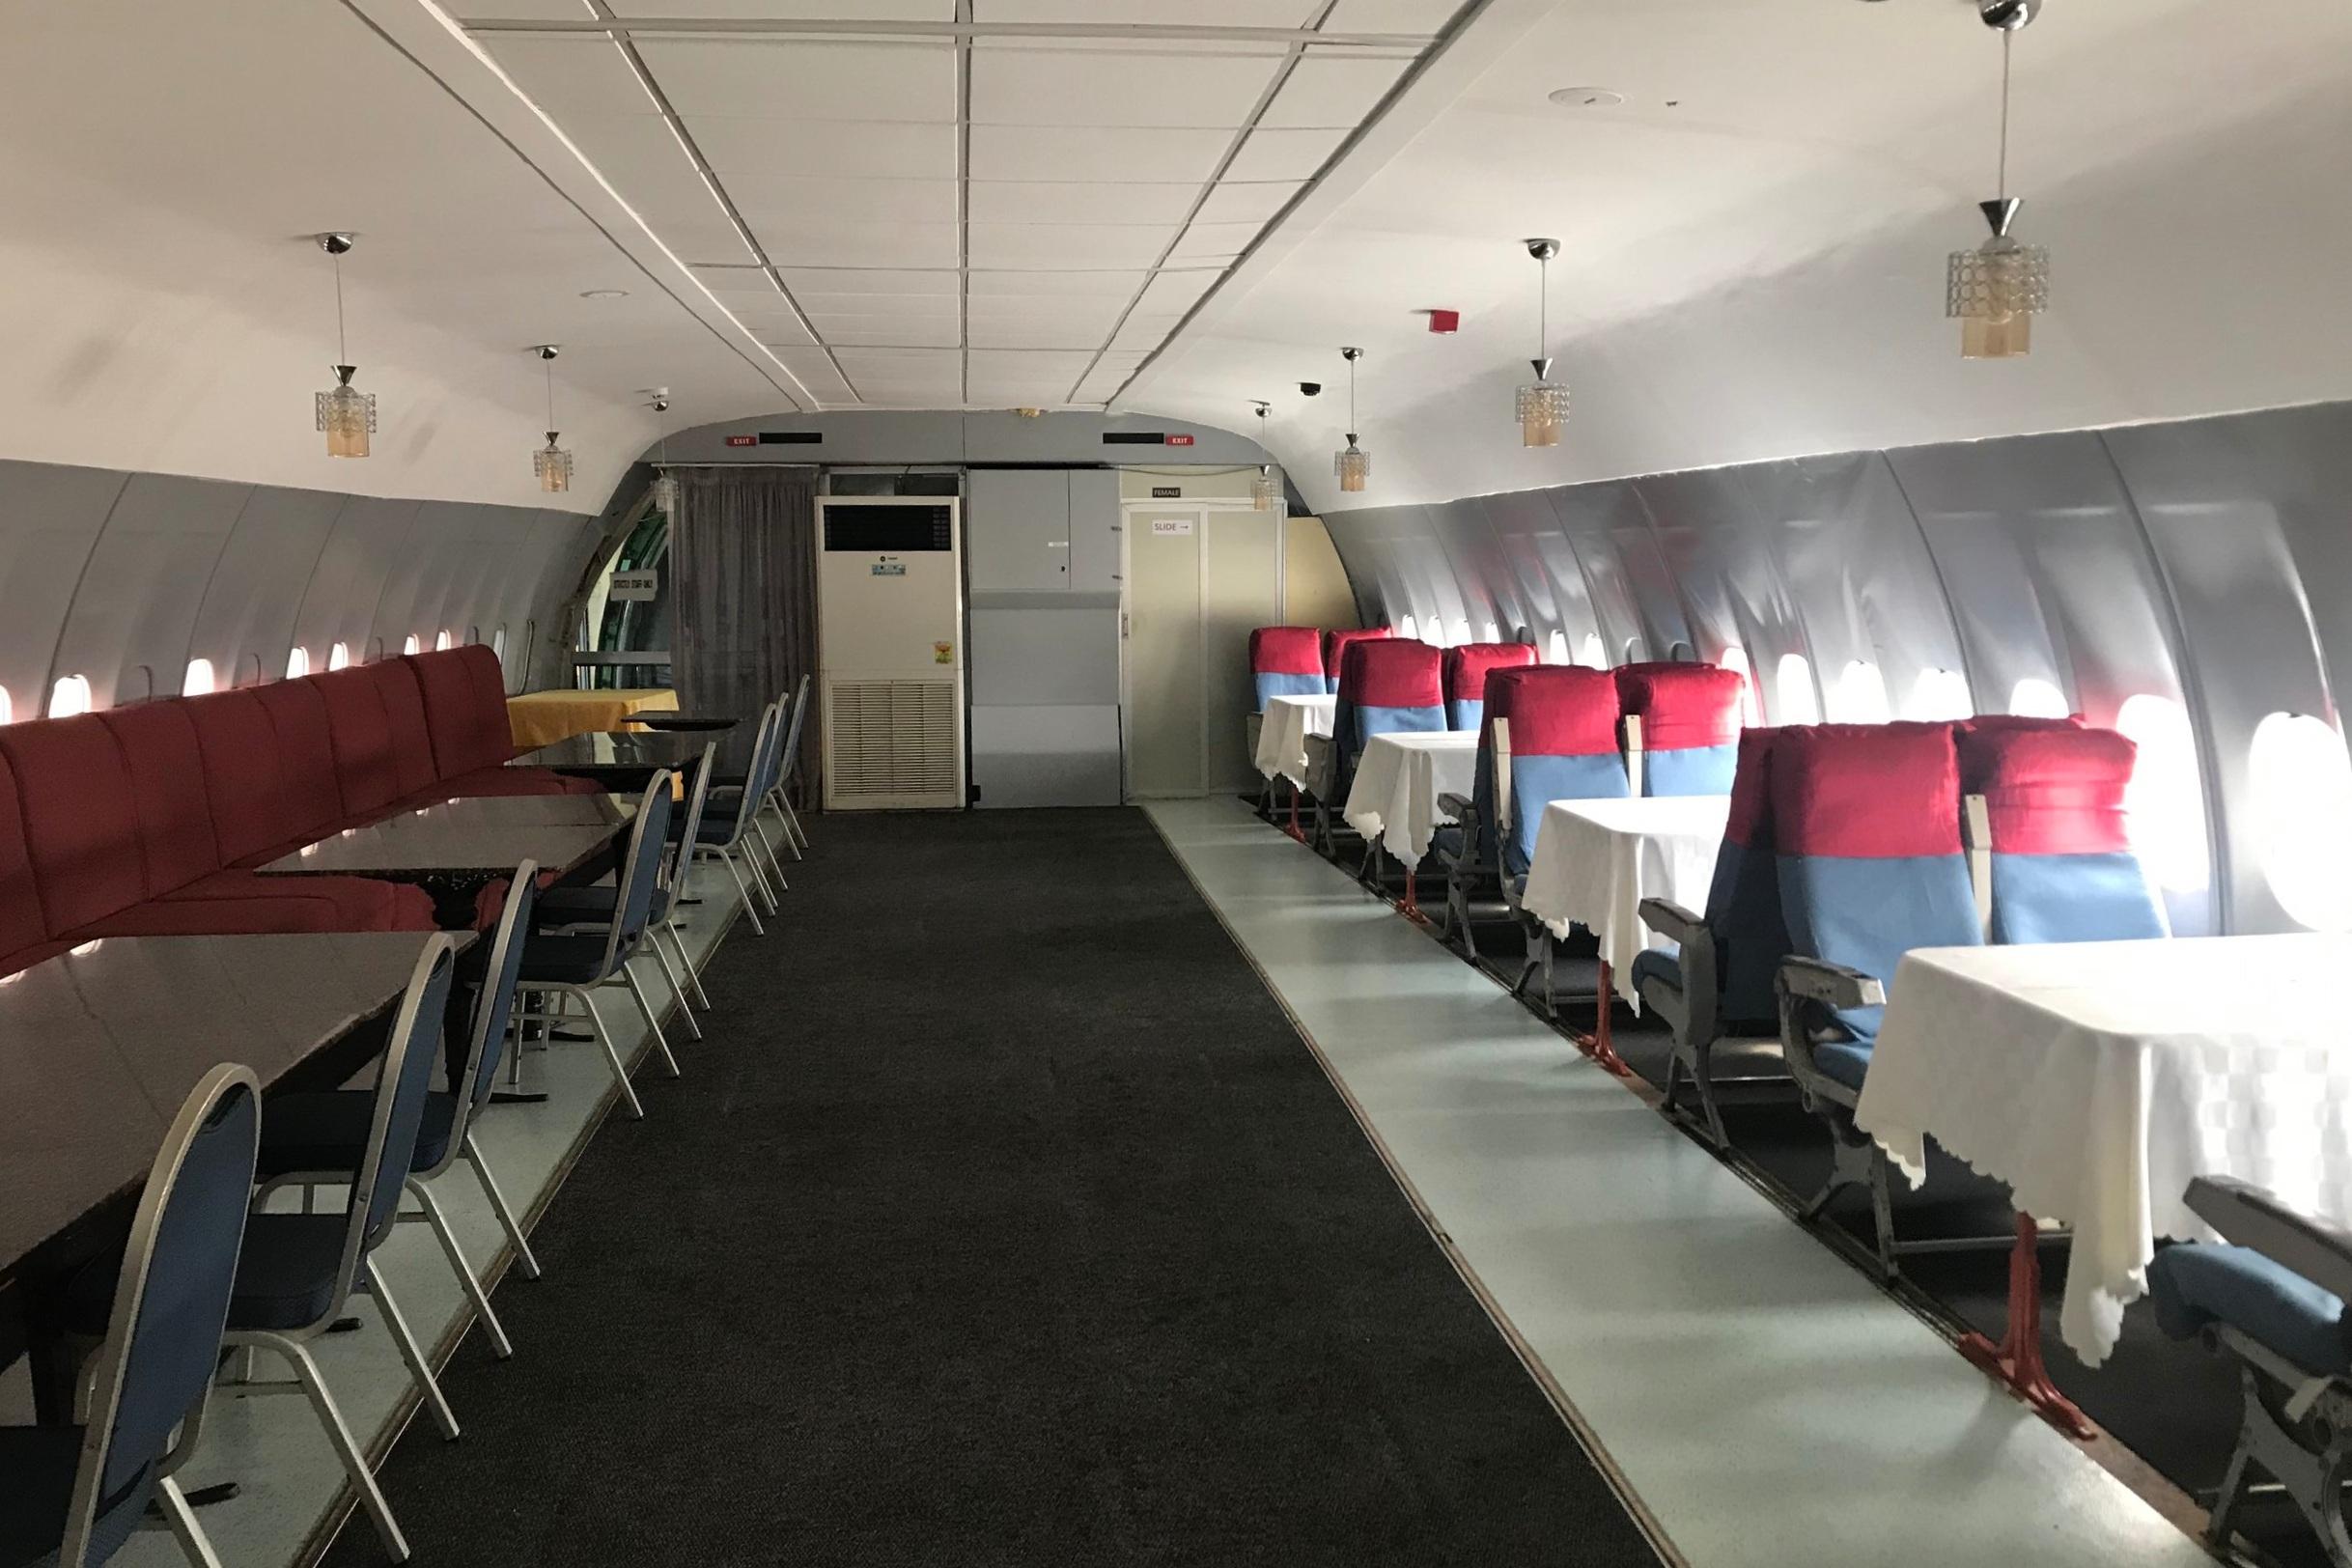 La Tante DC-10 Restaurant – Seating